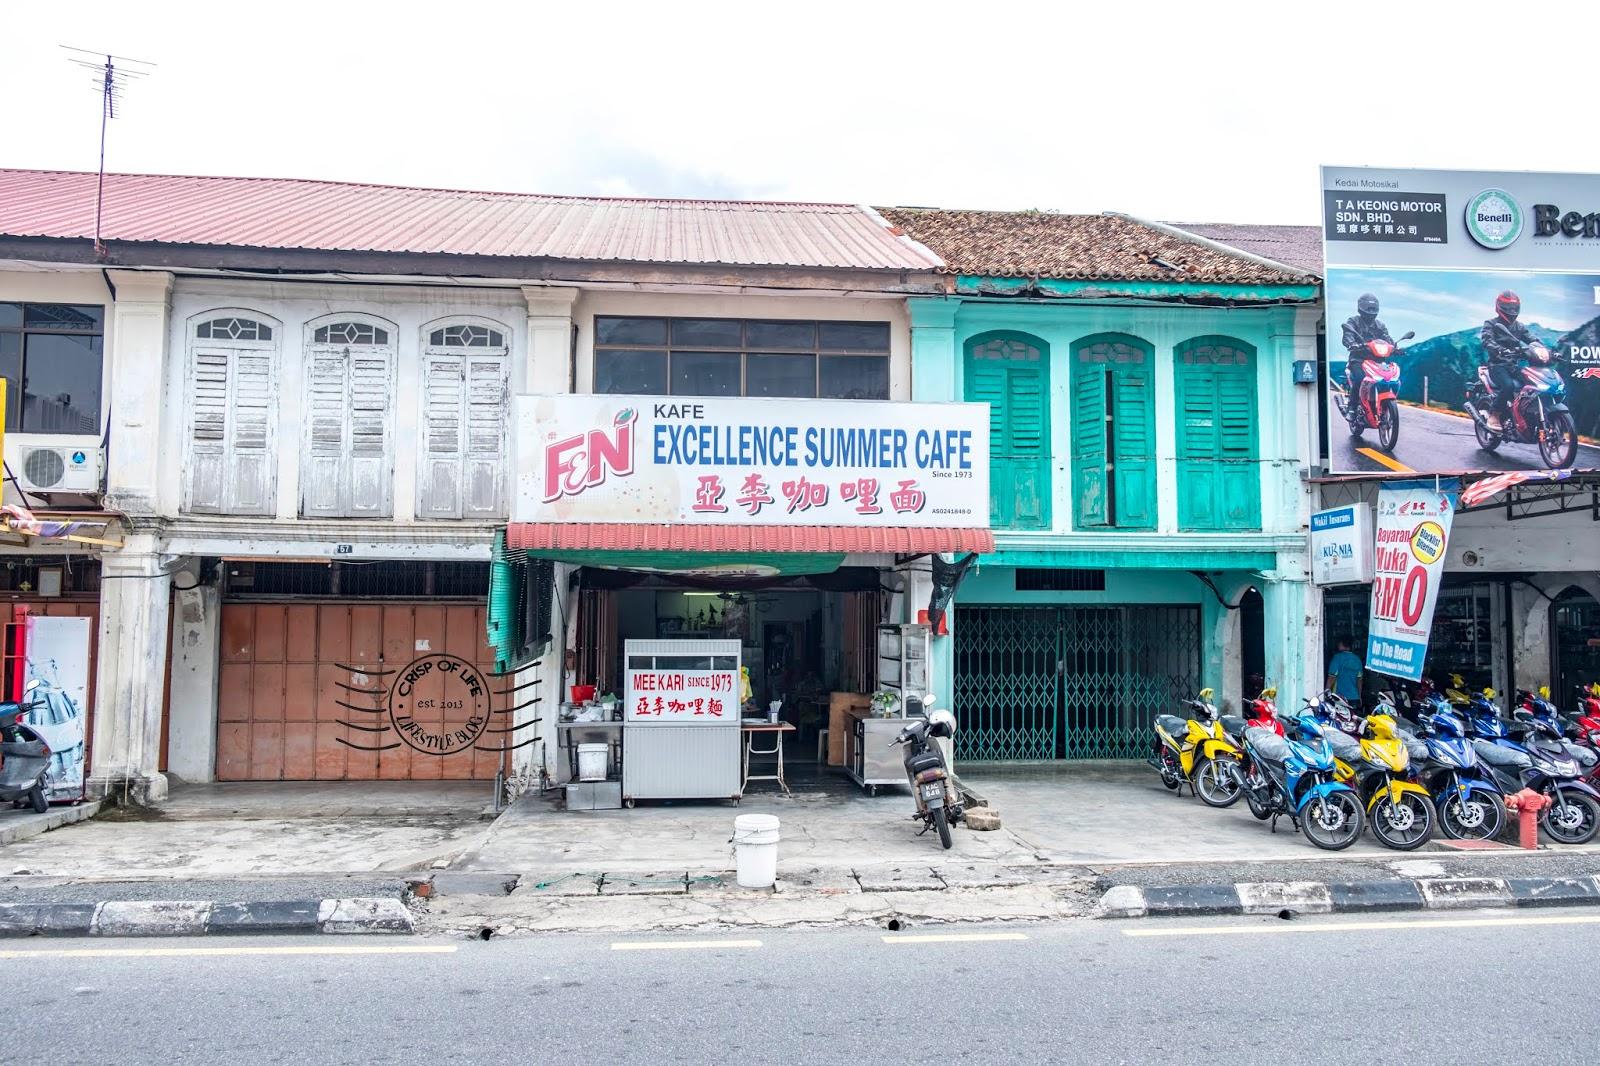 Curry Mee Since 1973 亚李咖哩面 @ Excellence Summer Cafe, Jalan Putra, Alor Setar